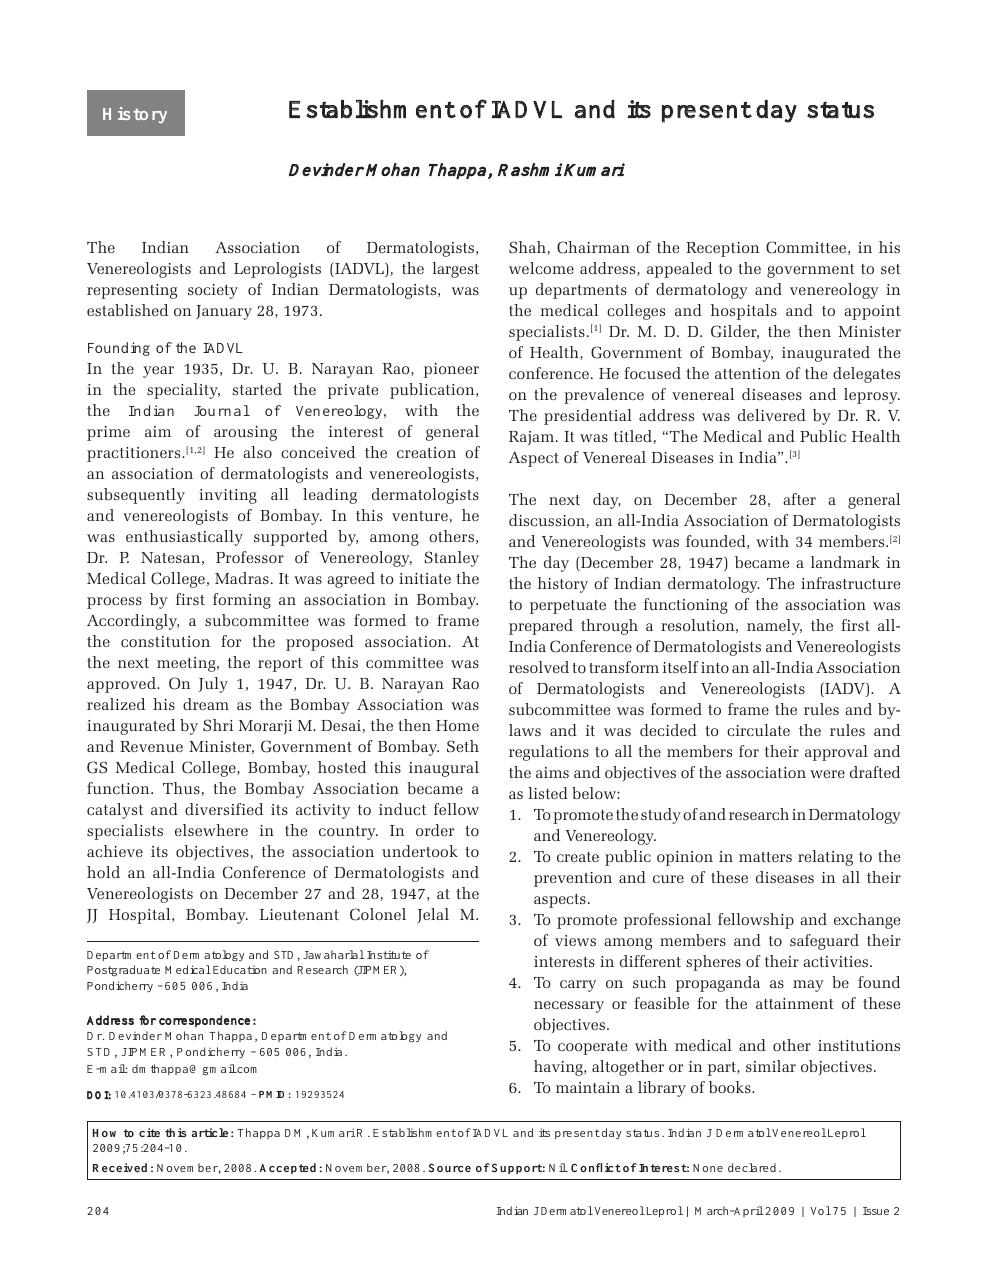 Establishment of IADVL and its present day status – topic of